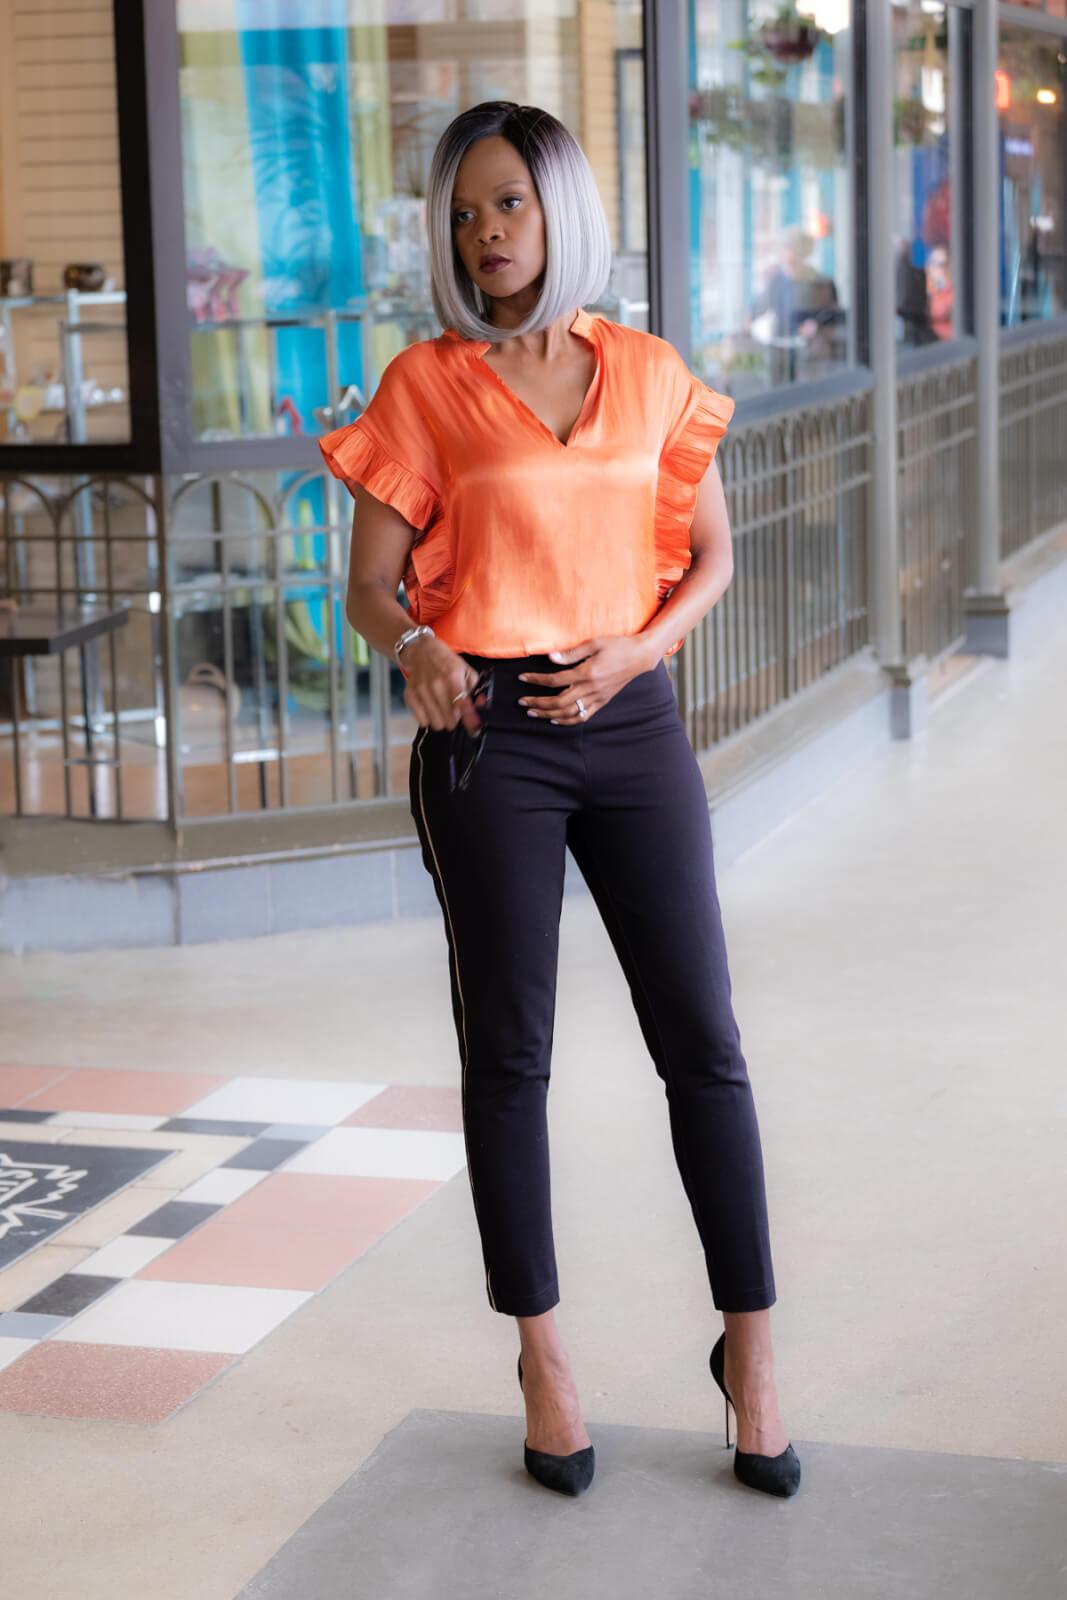 neon orange top, Spring fashion, Neon trend, Winnipeg Fashion blogger, Orange ruffle top